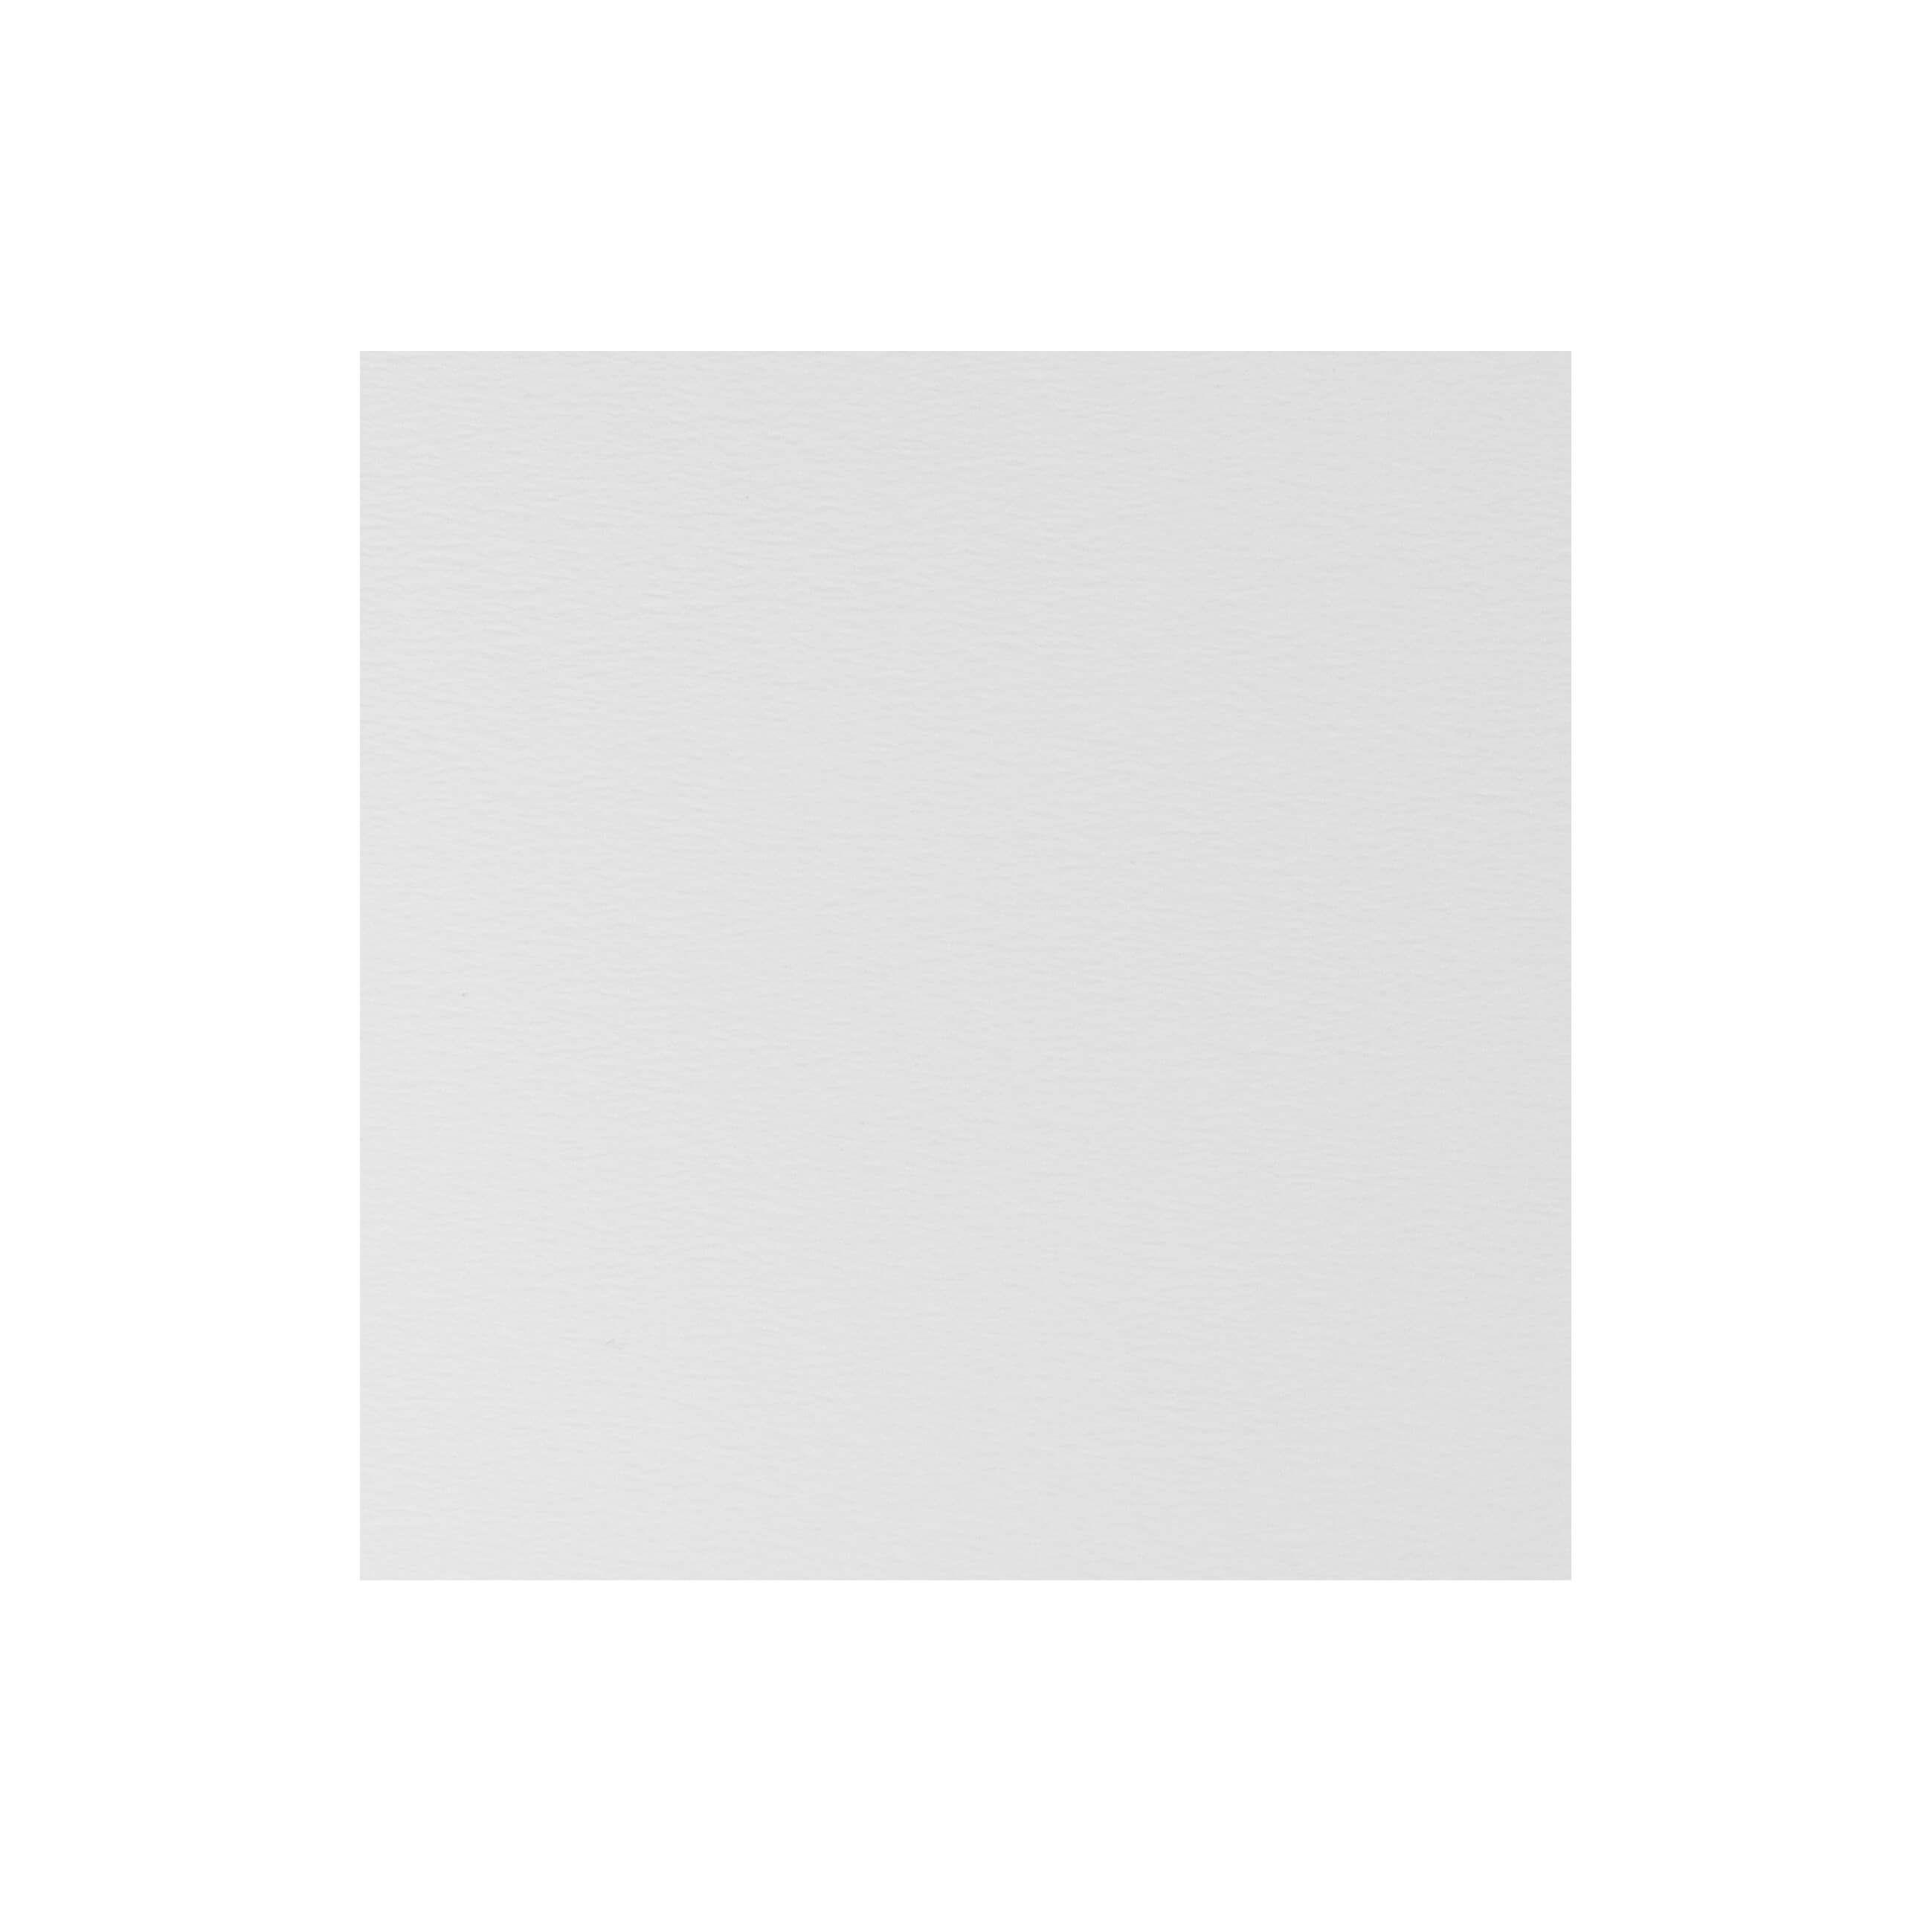 Enfolio Pocket Card Cardmount - Accent Antique White